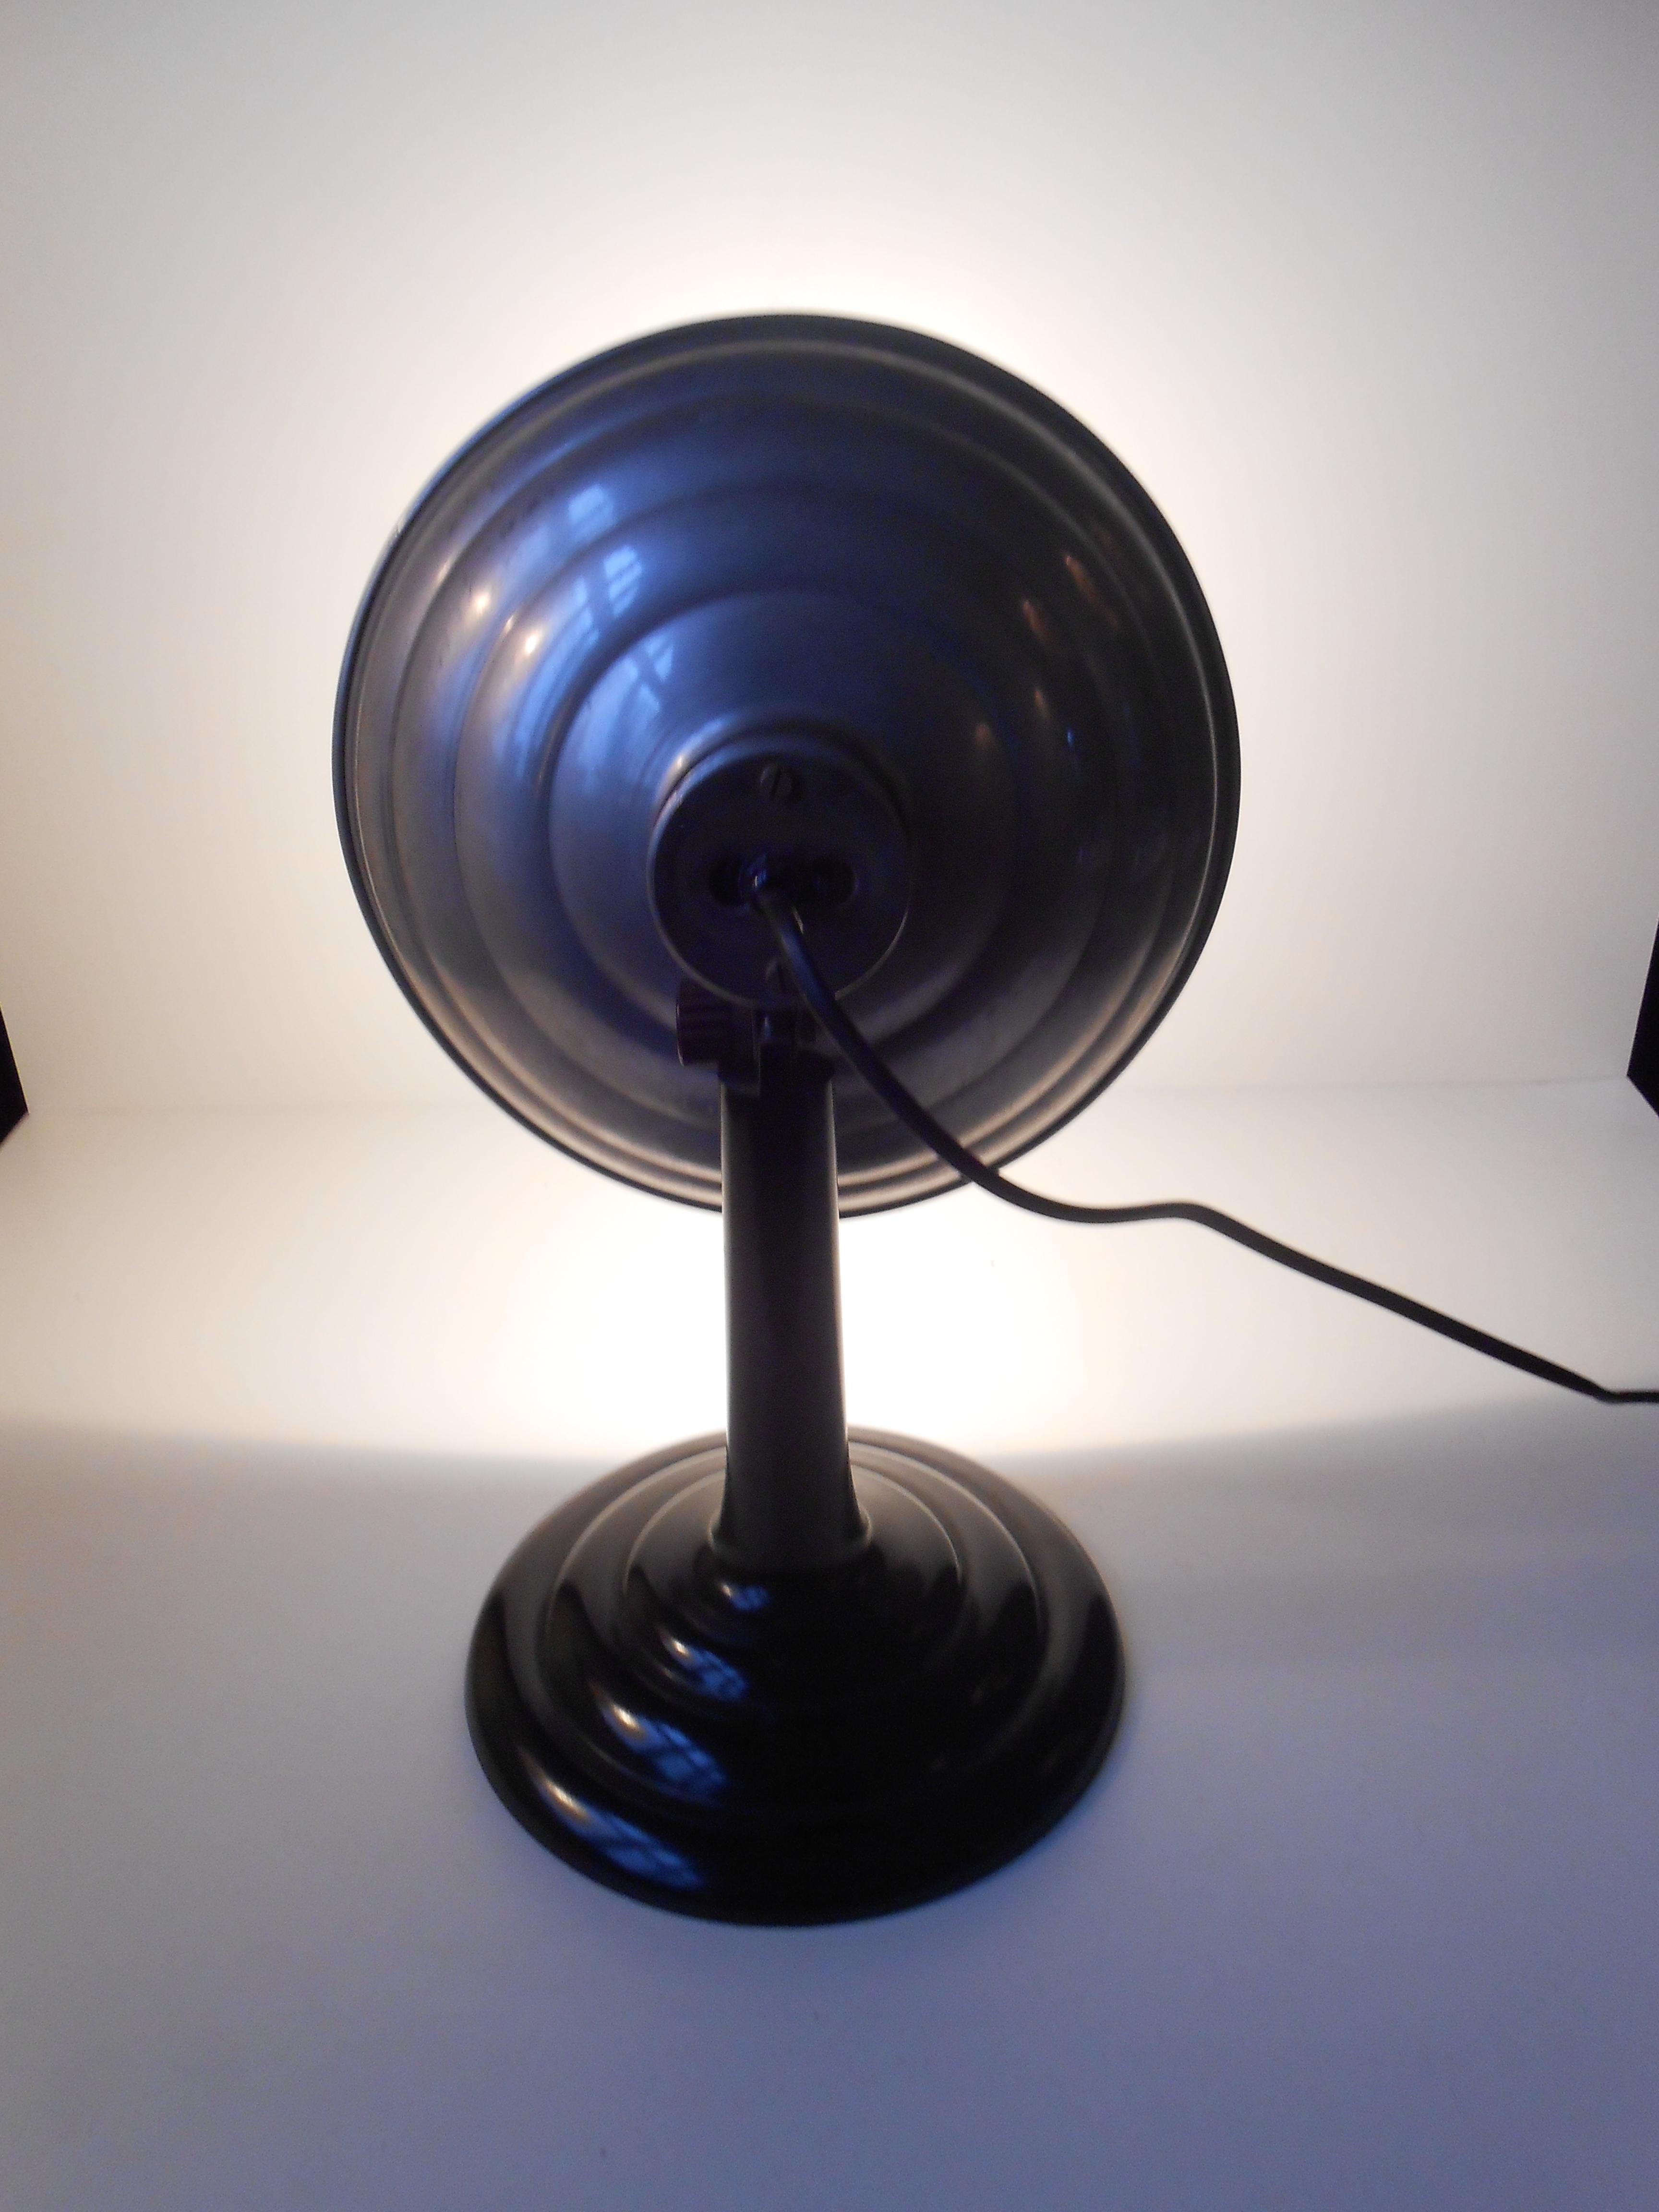 Industri / laege lampe: tysk design 1950?erne ? retro-design.dk